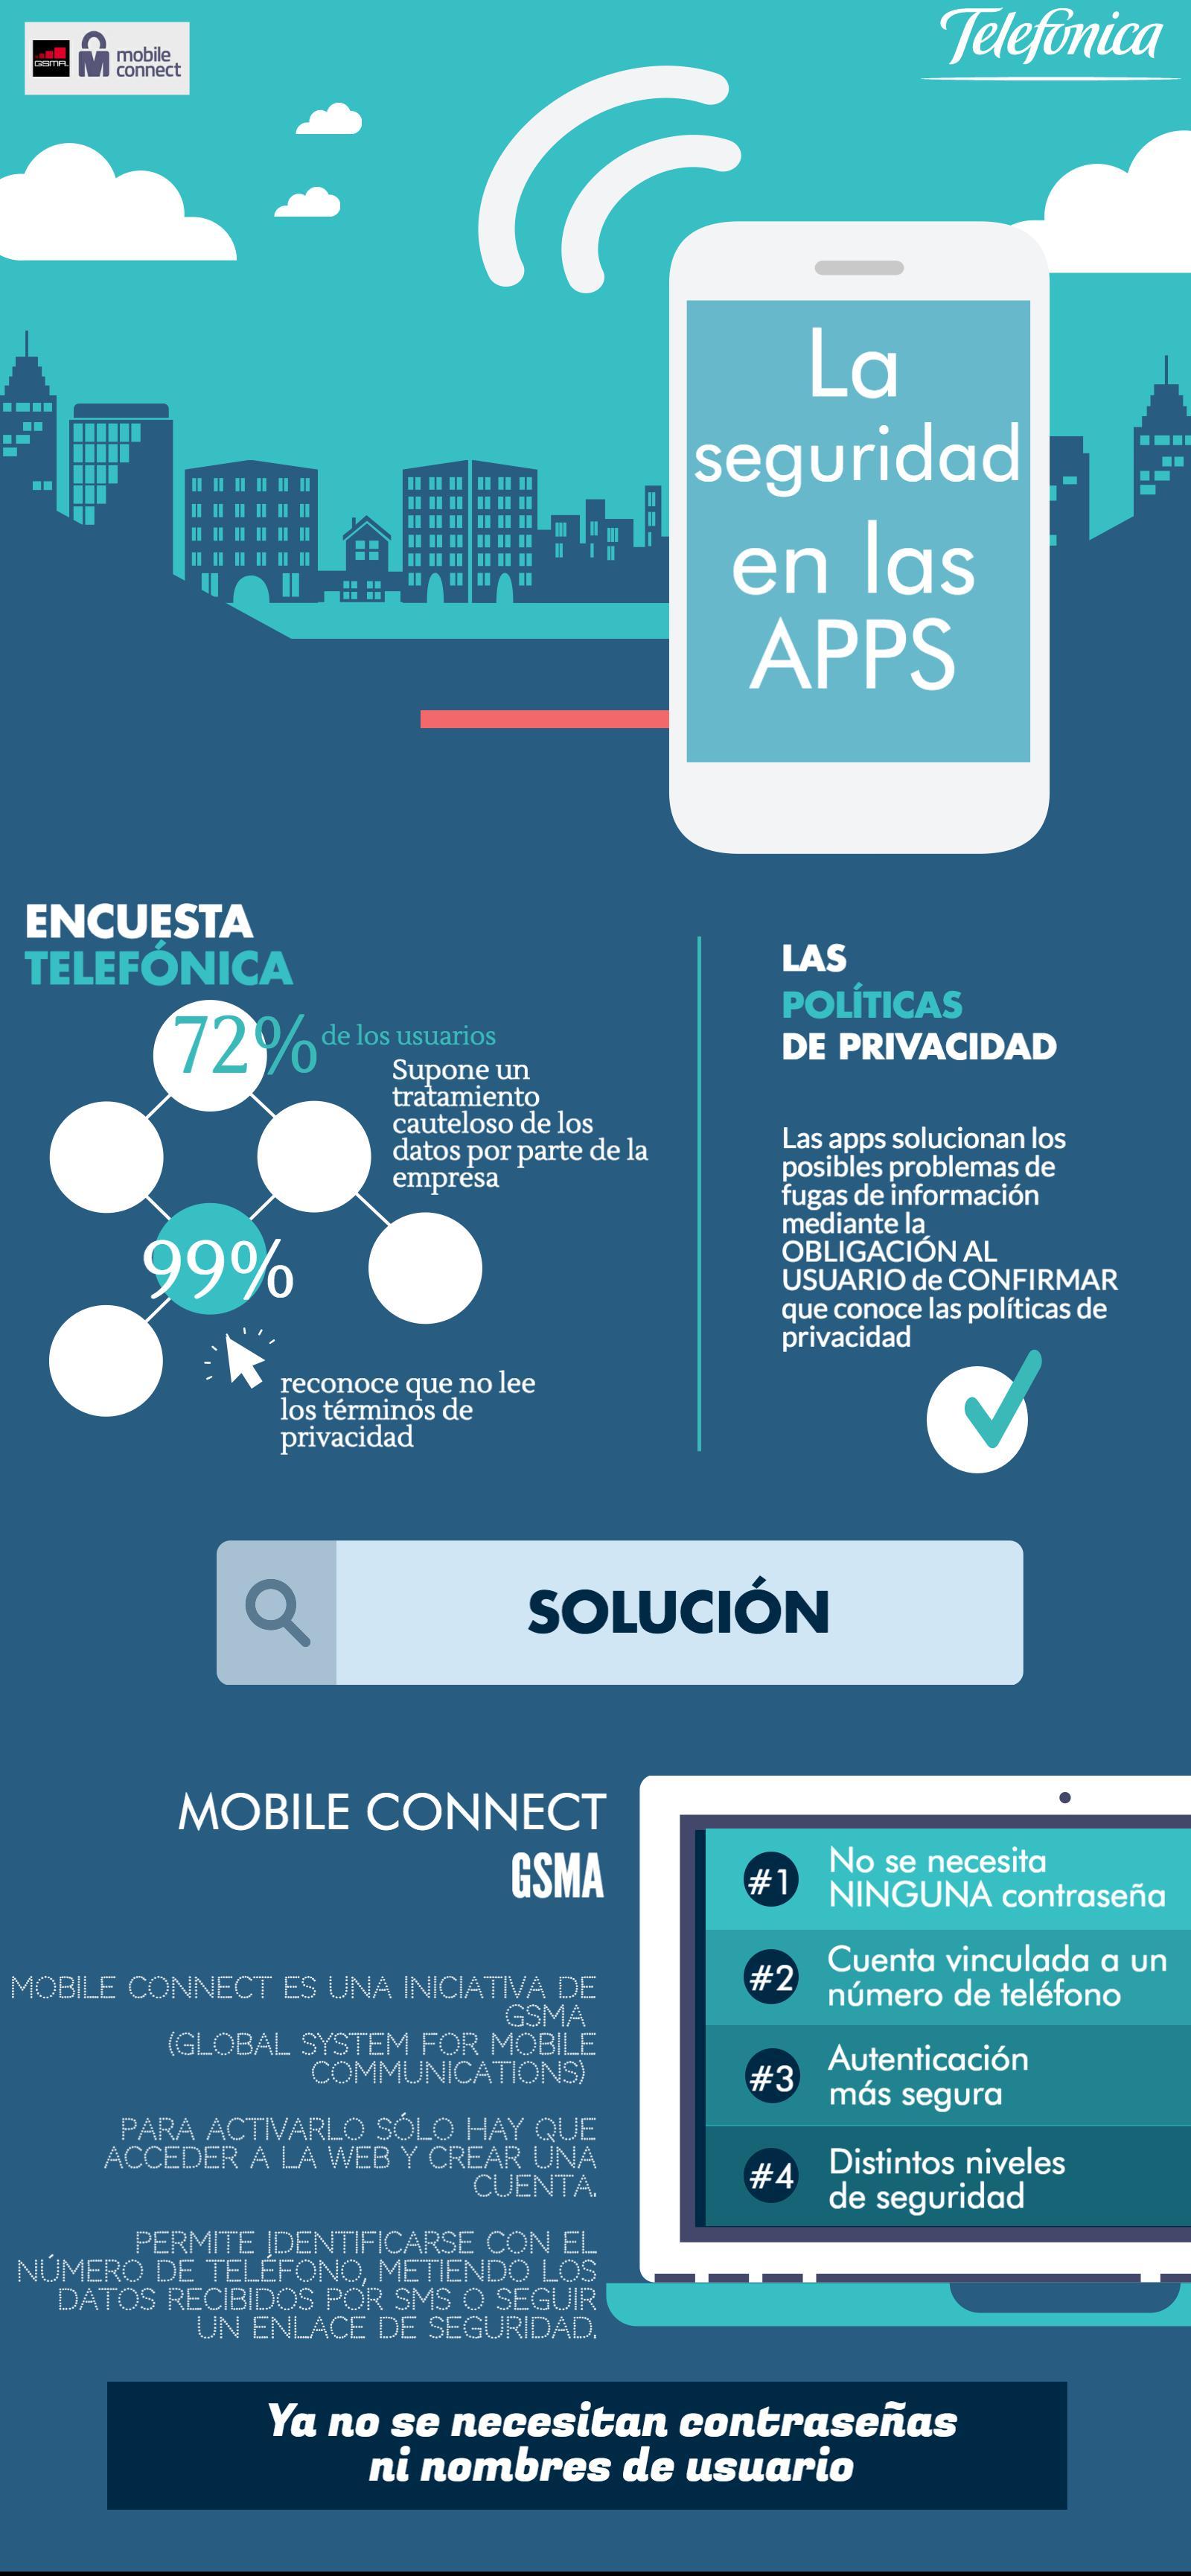 telefonica-mobile-connect-infografia